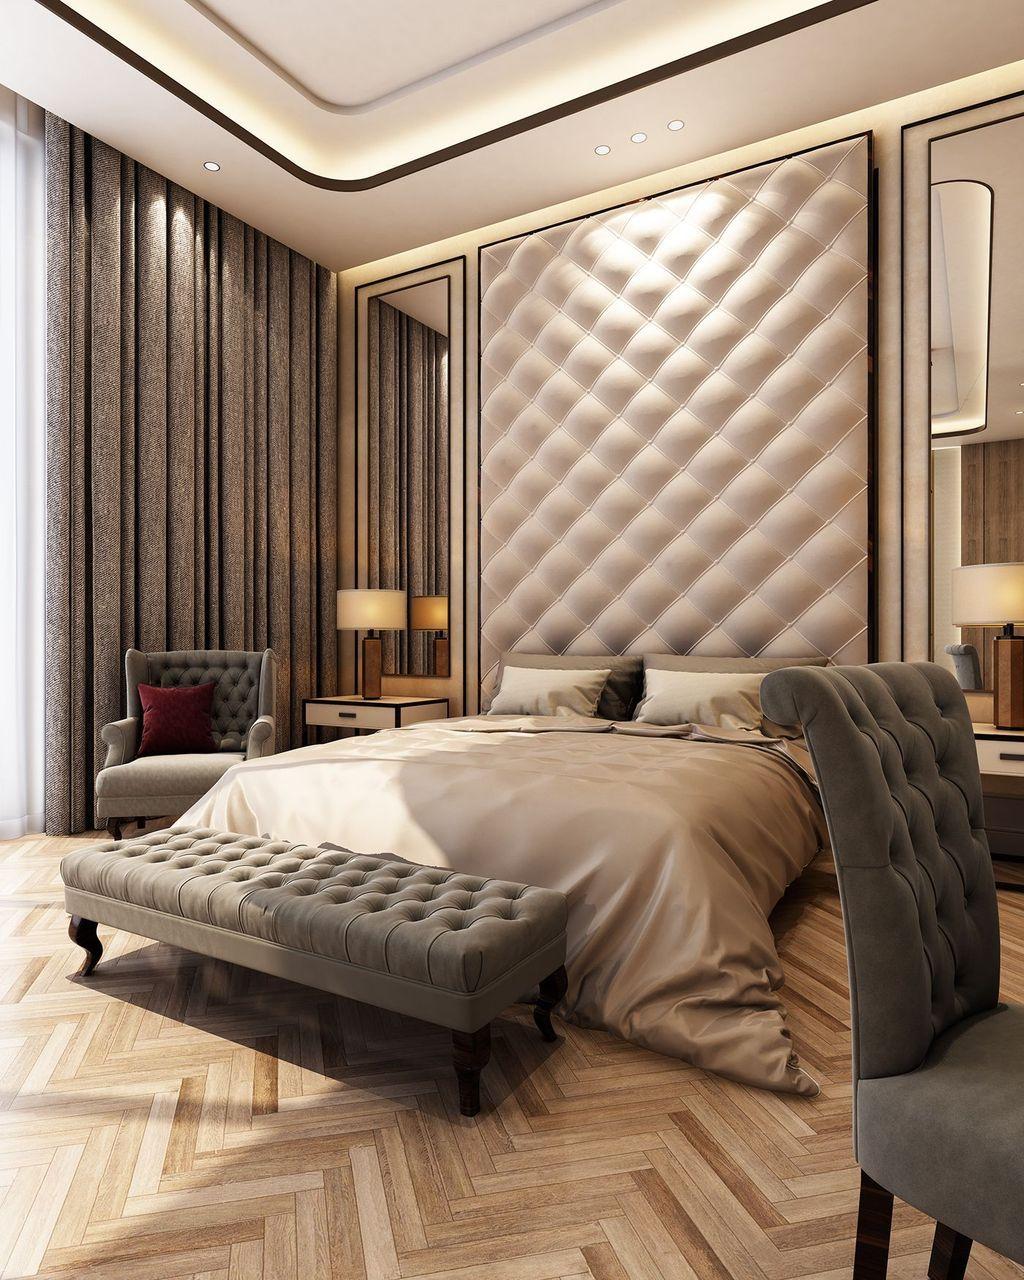 46 comfy urban master bedroom ideas luxury bedroom on dreamy luxurious master bedroom designs and decor ideas id=92840